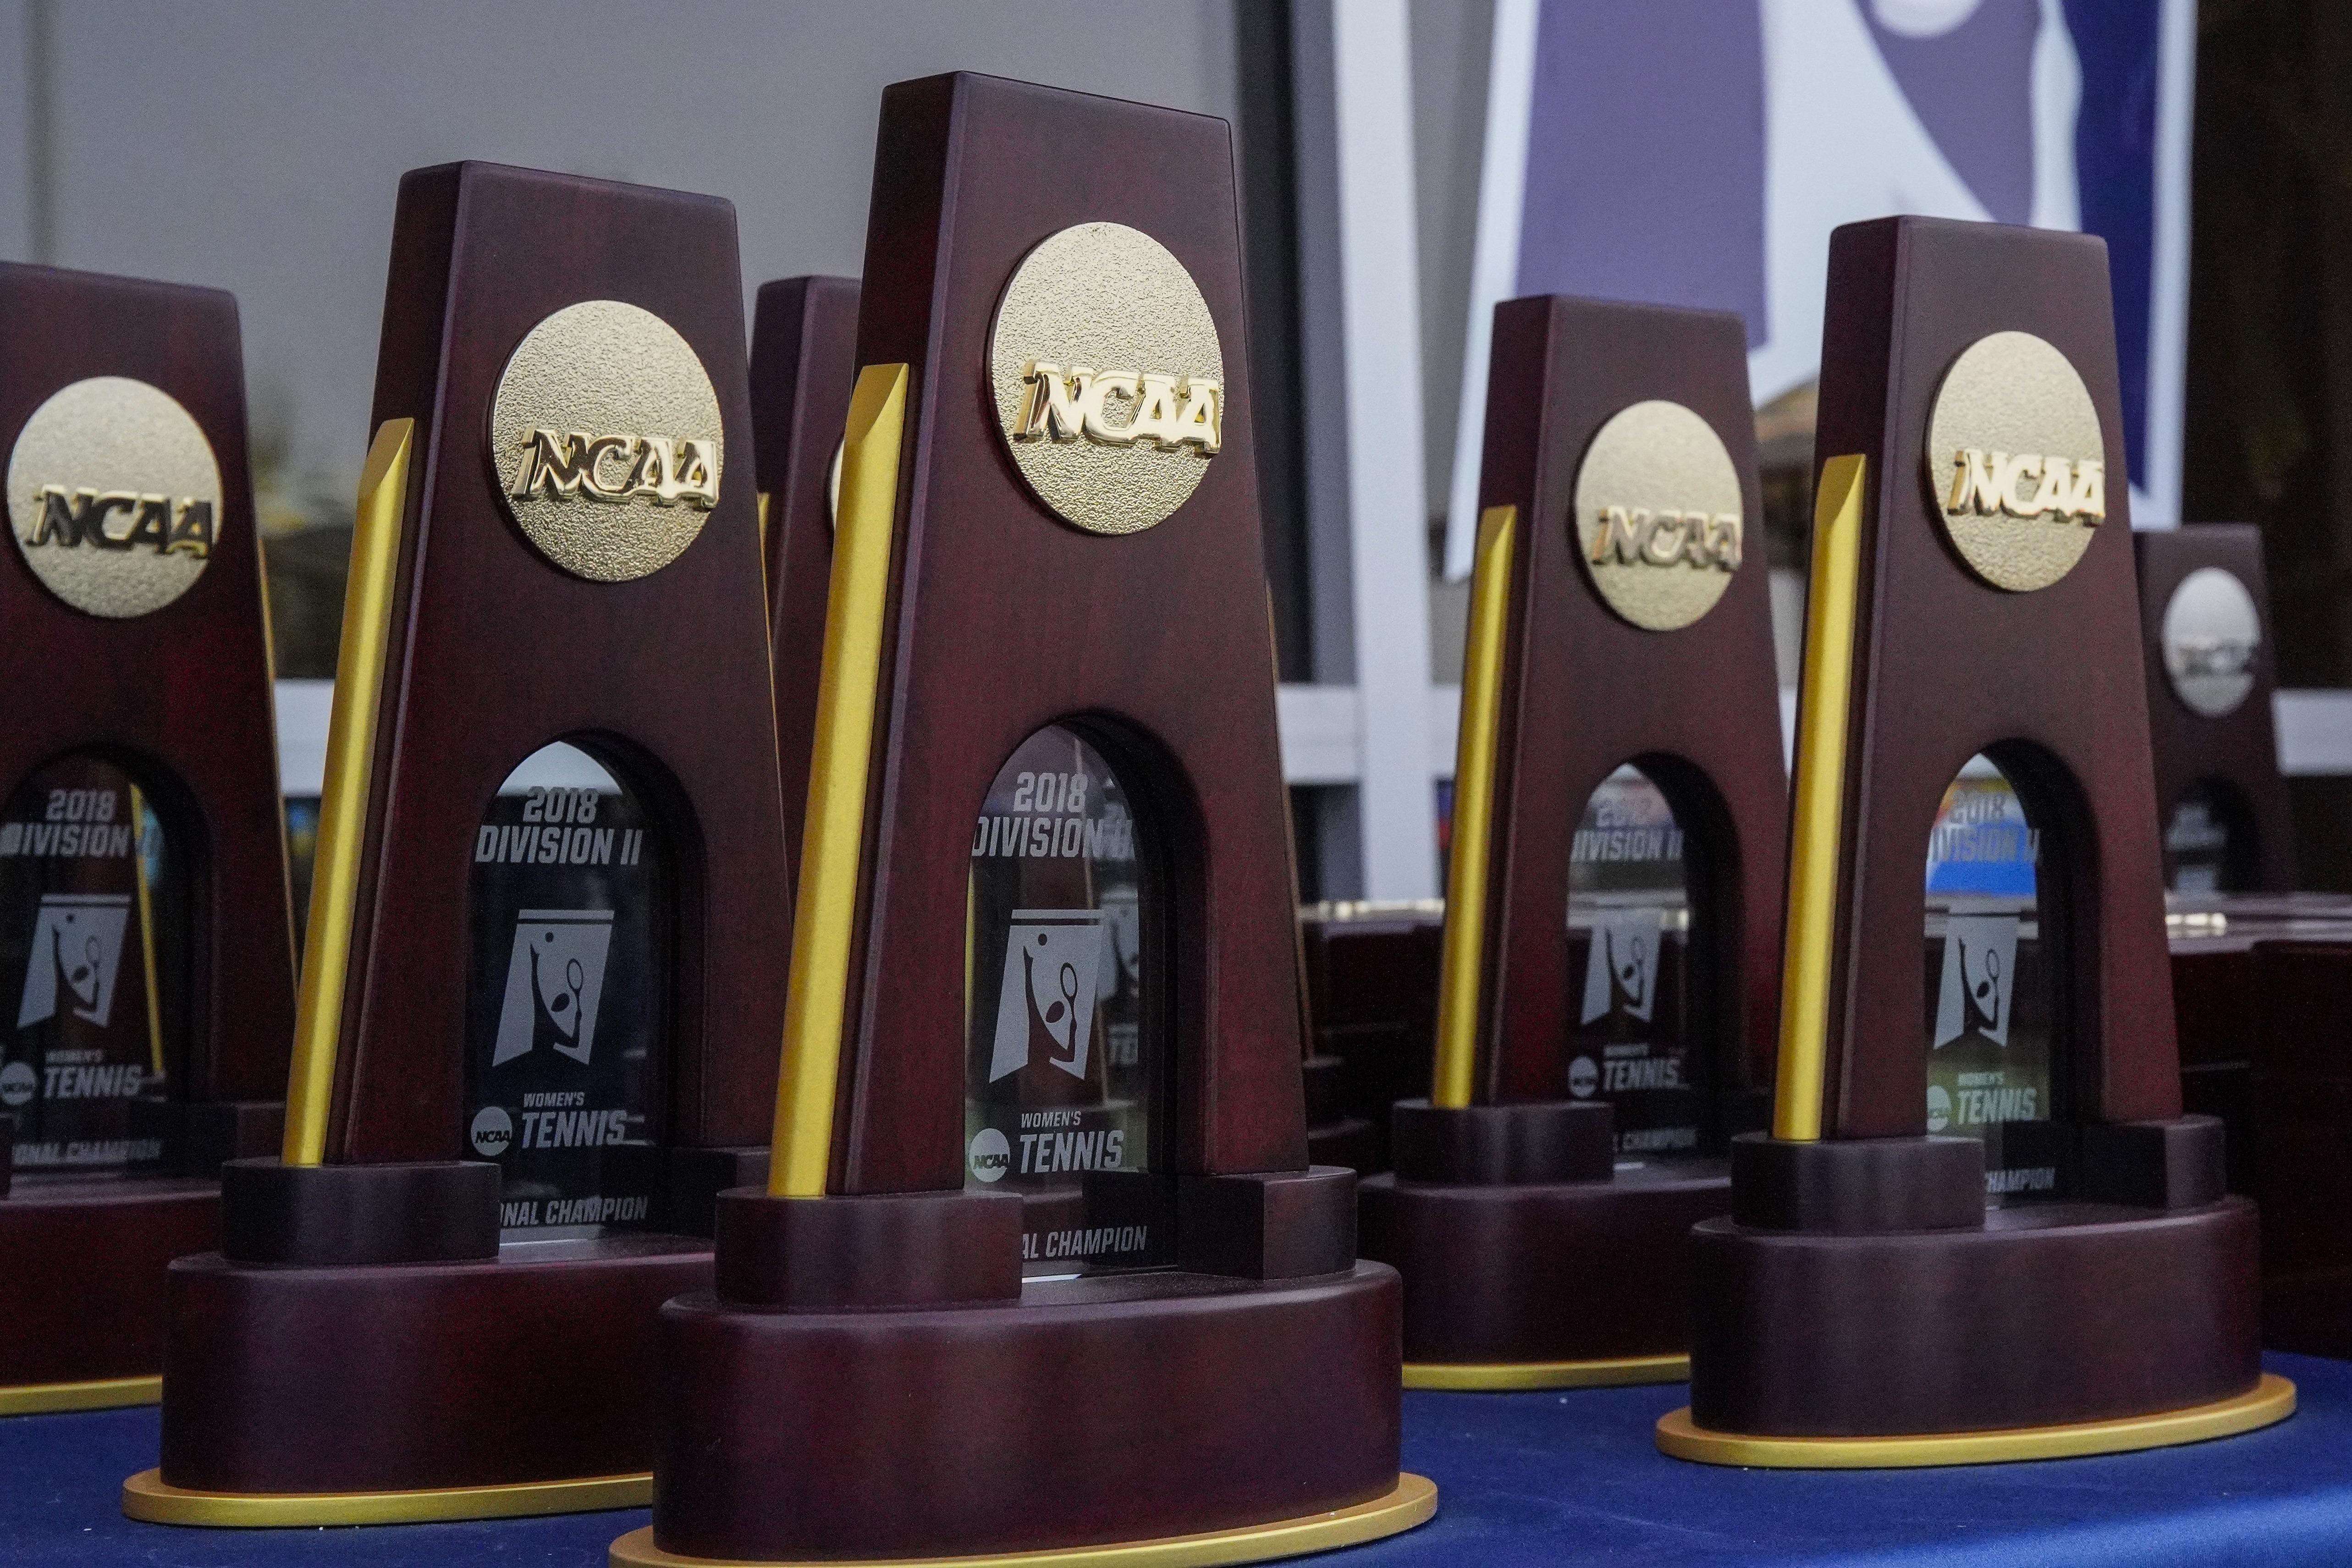 2018 NCAA Division II Women's Tennis Championship